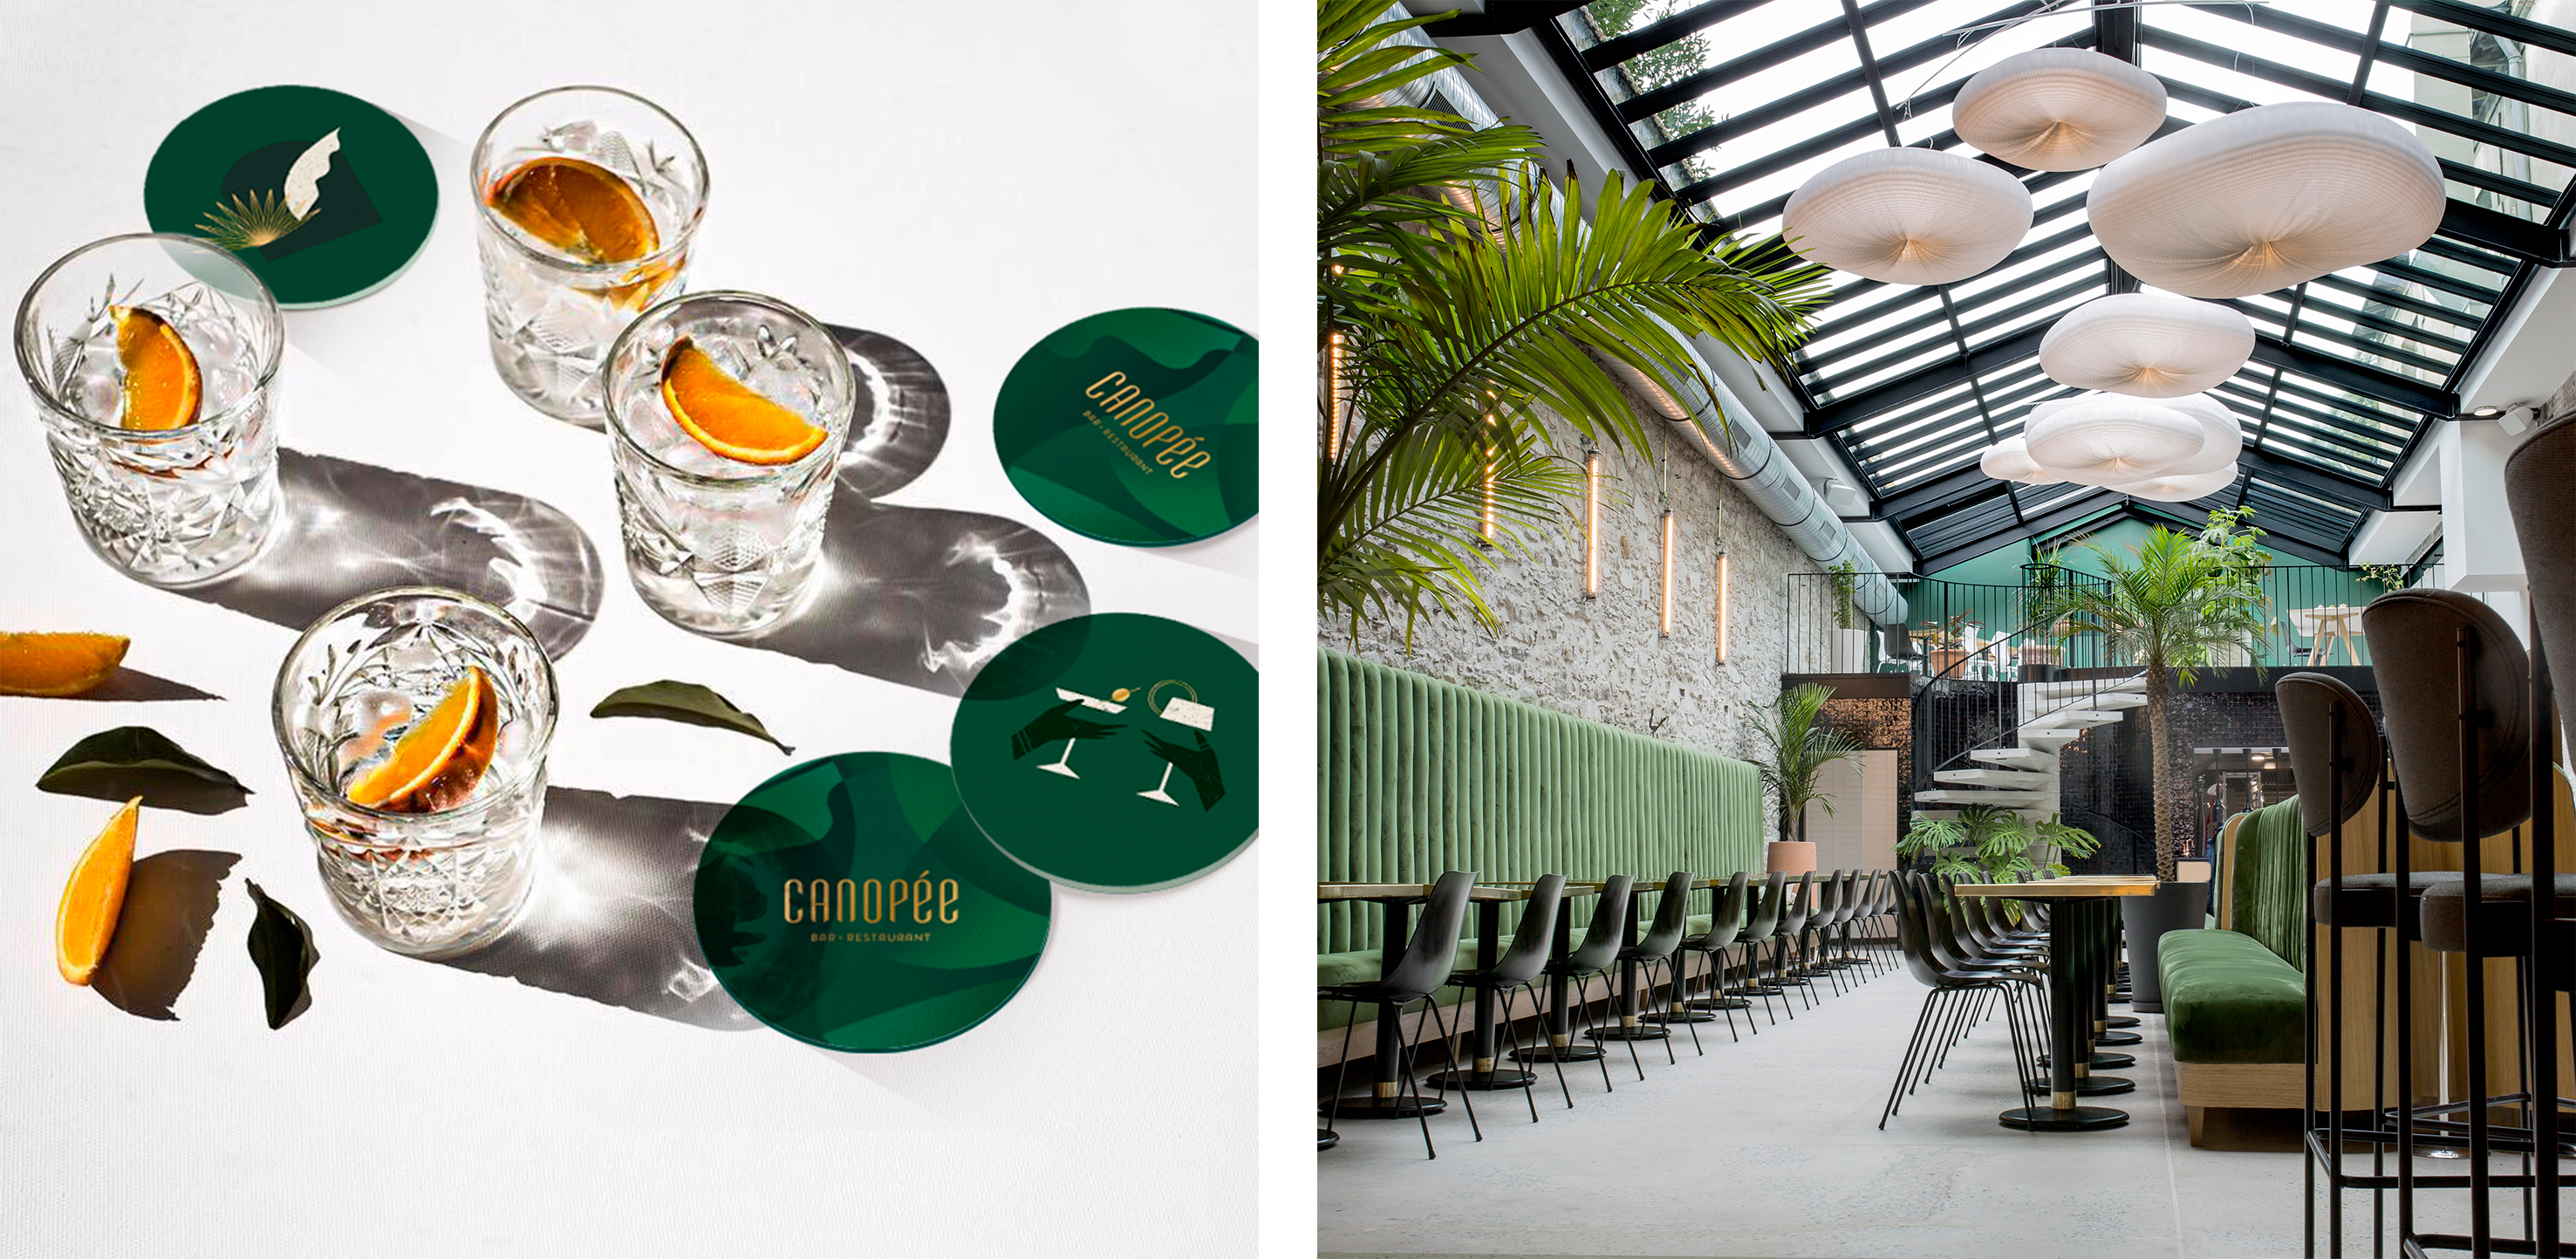 Restaurant-Luxe-Design-Graphique-Nantes-Canopee-6